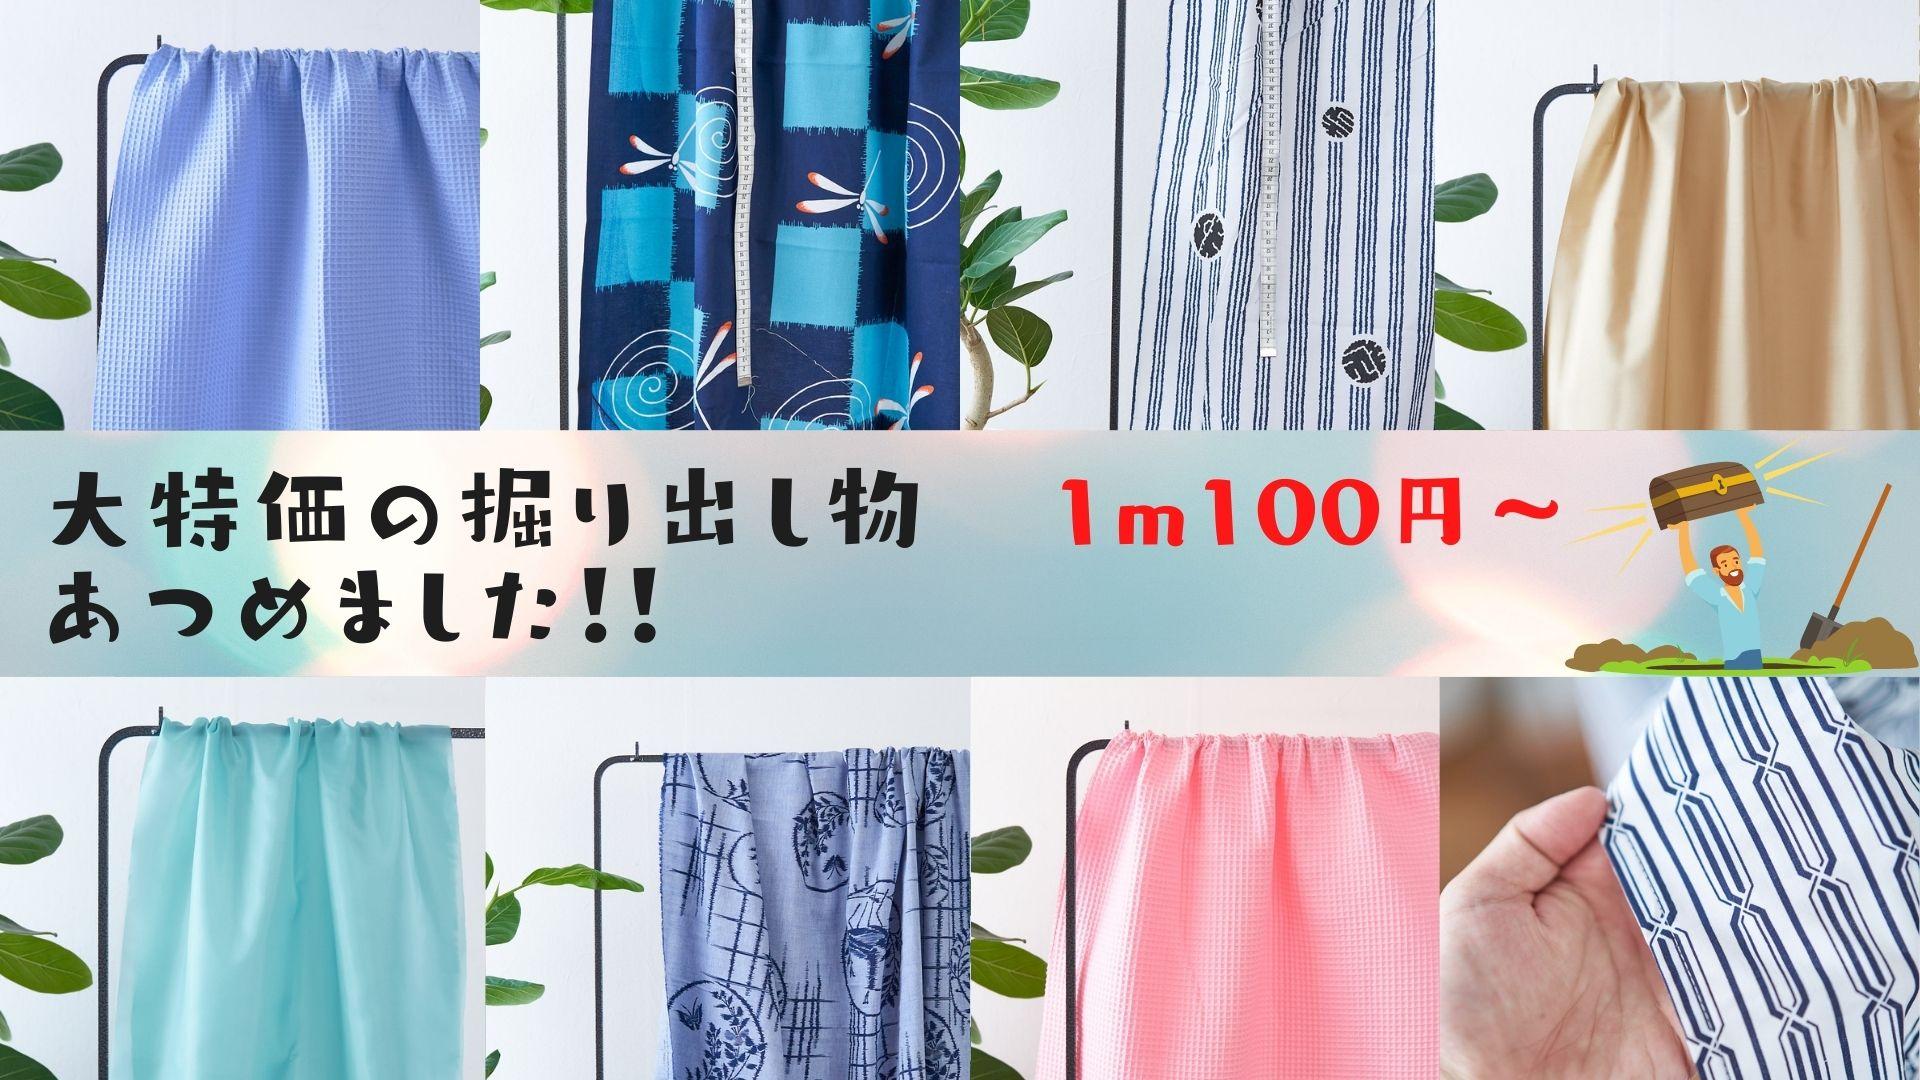 /wakeari/wakeari-banner.jpg